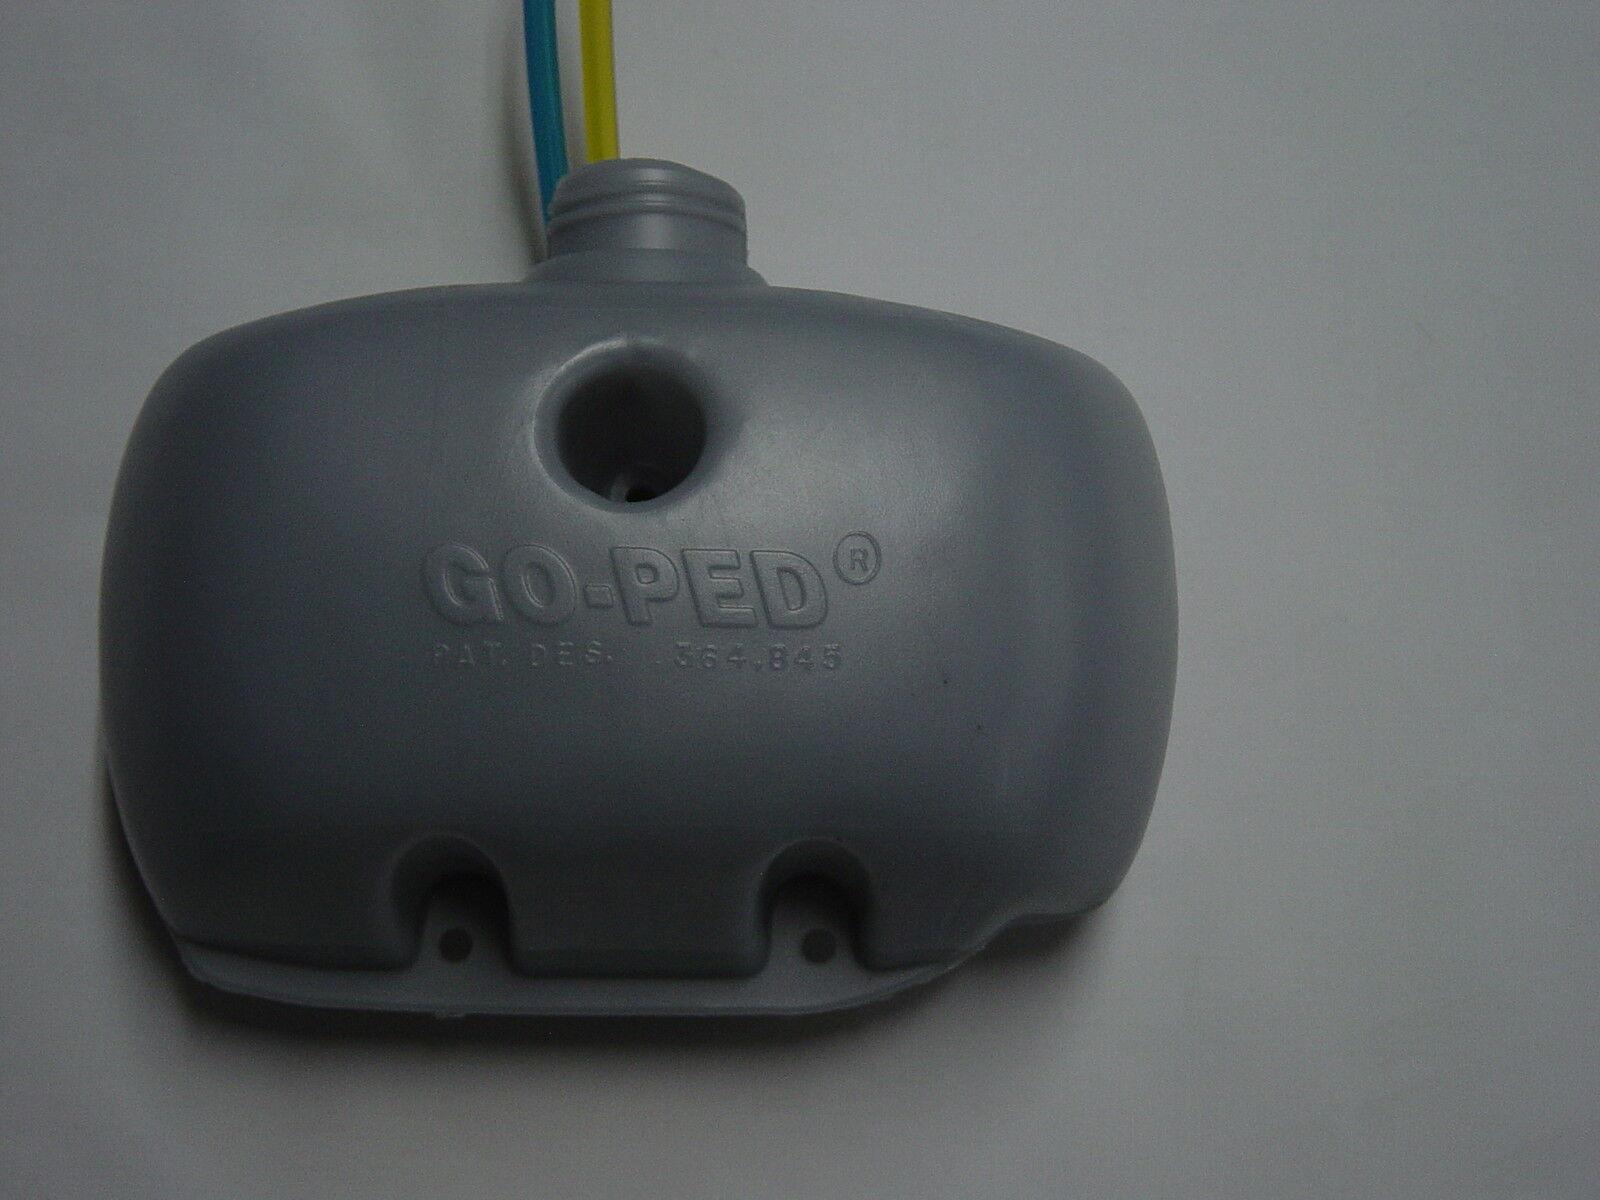 12 filtros Hepa 1 fregona T700 M501-A//M501-B//M520 M301 GYing Kit de accesorios para fregona Lefant 8 cepillos laterales pieza de repuesto para aspiradora rob/ótica